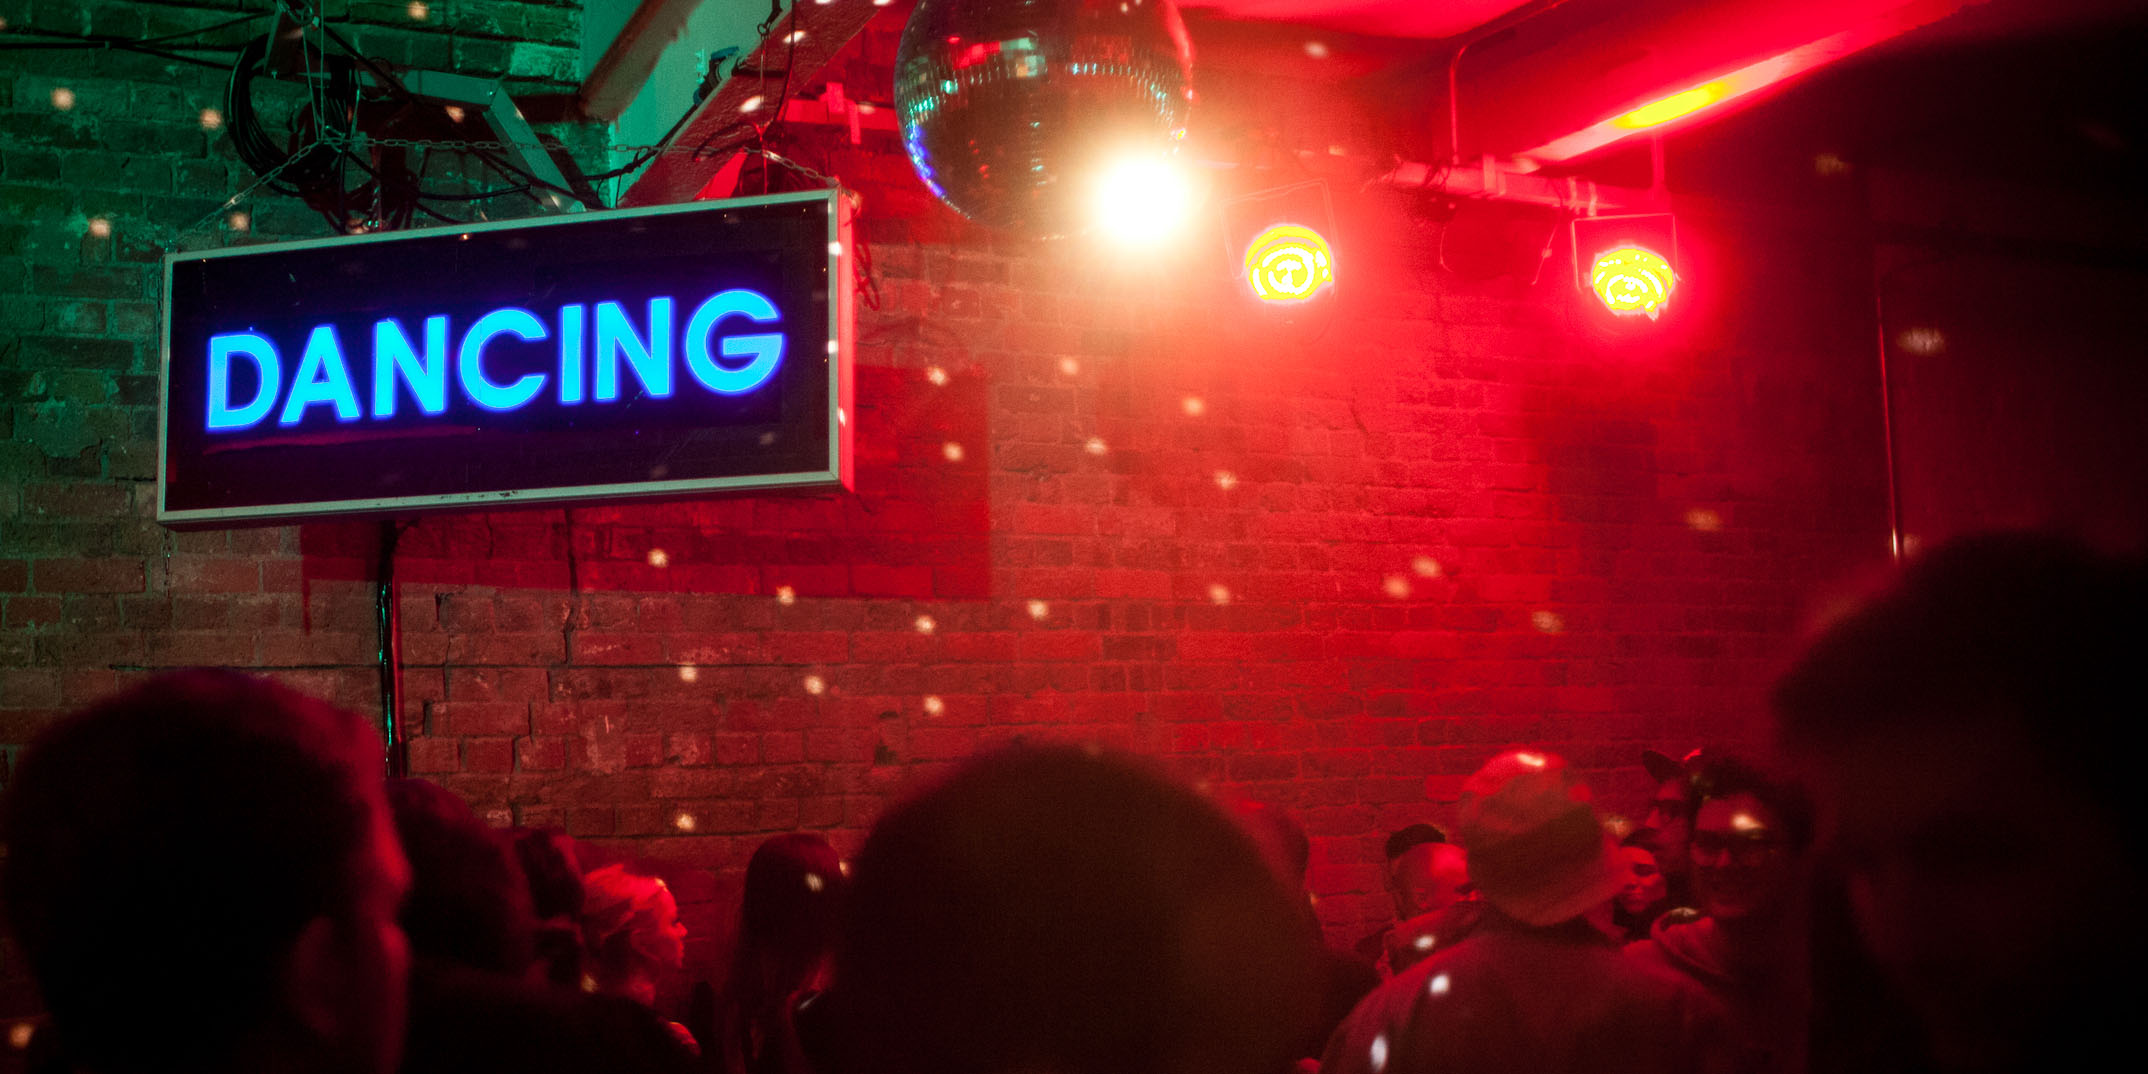 Loft studios review kensal green club london designmynight for London club este